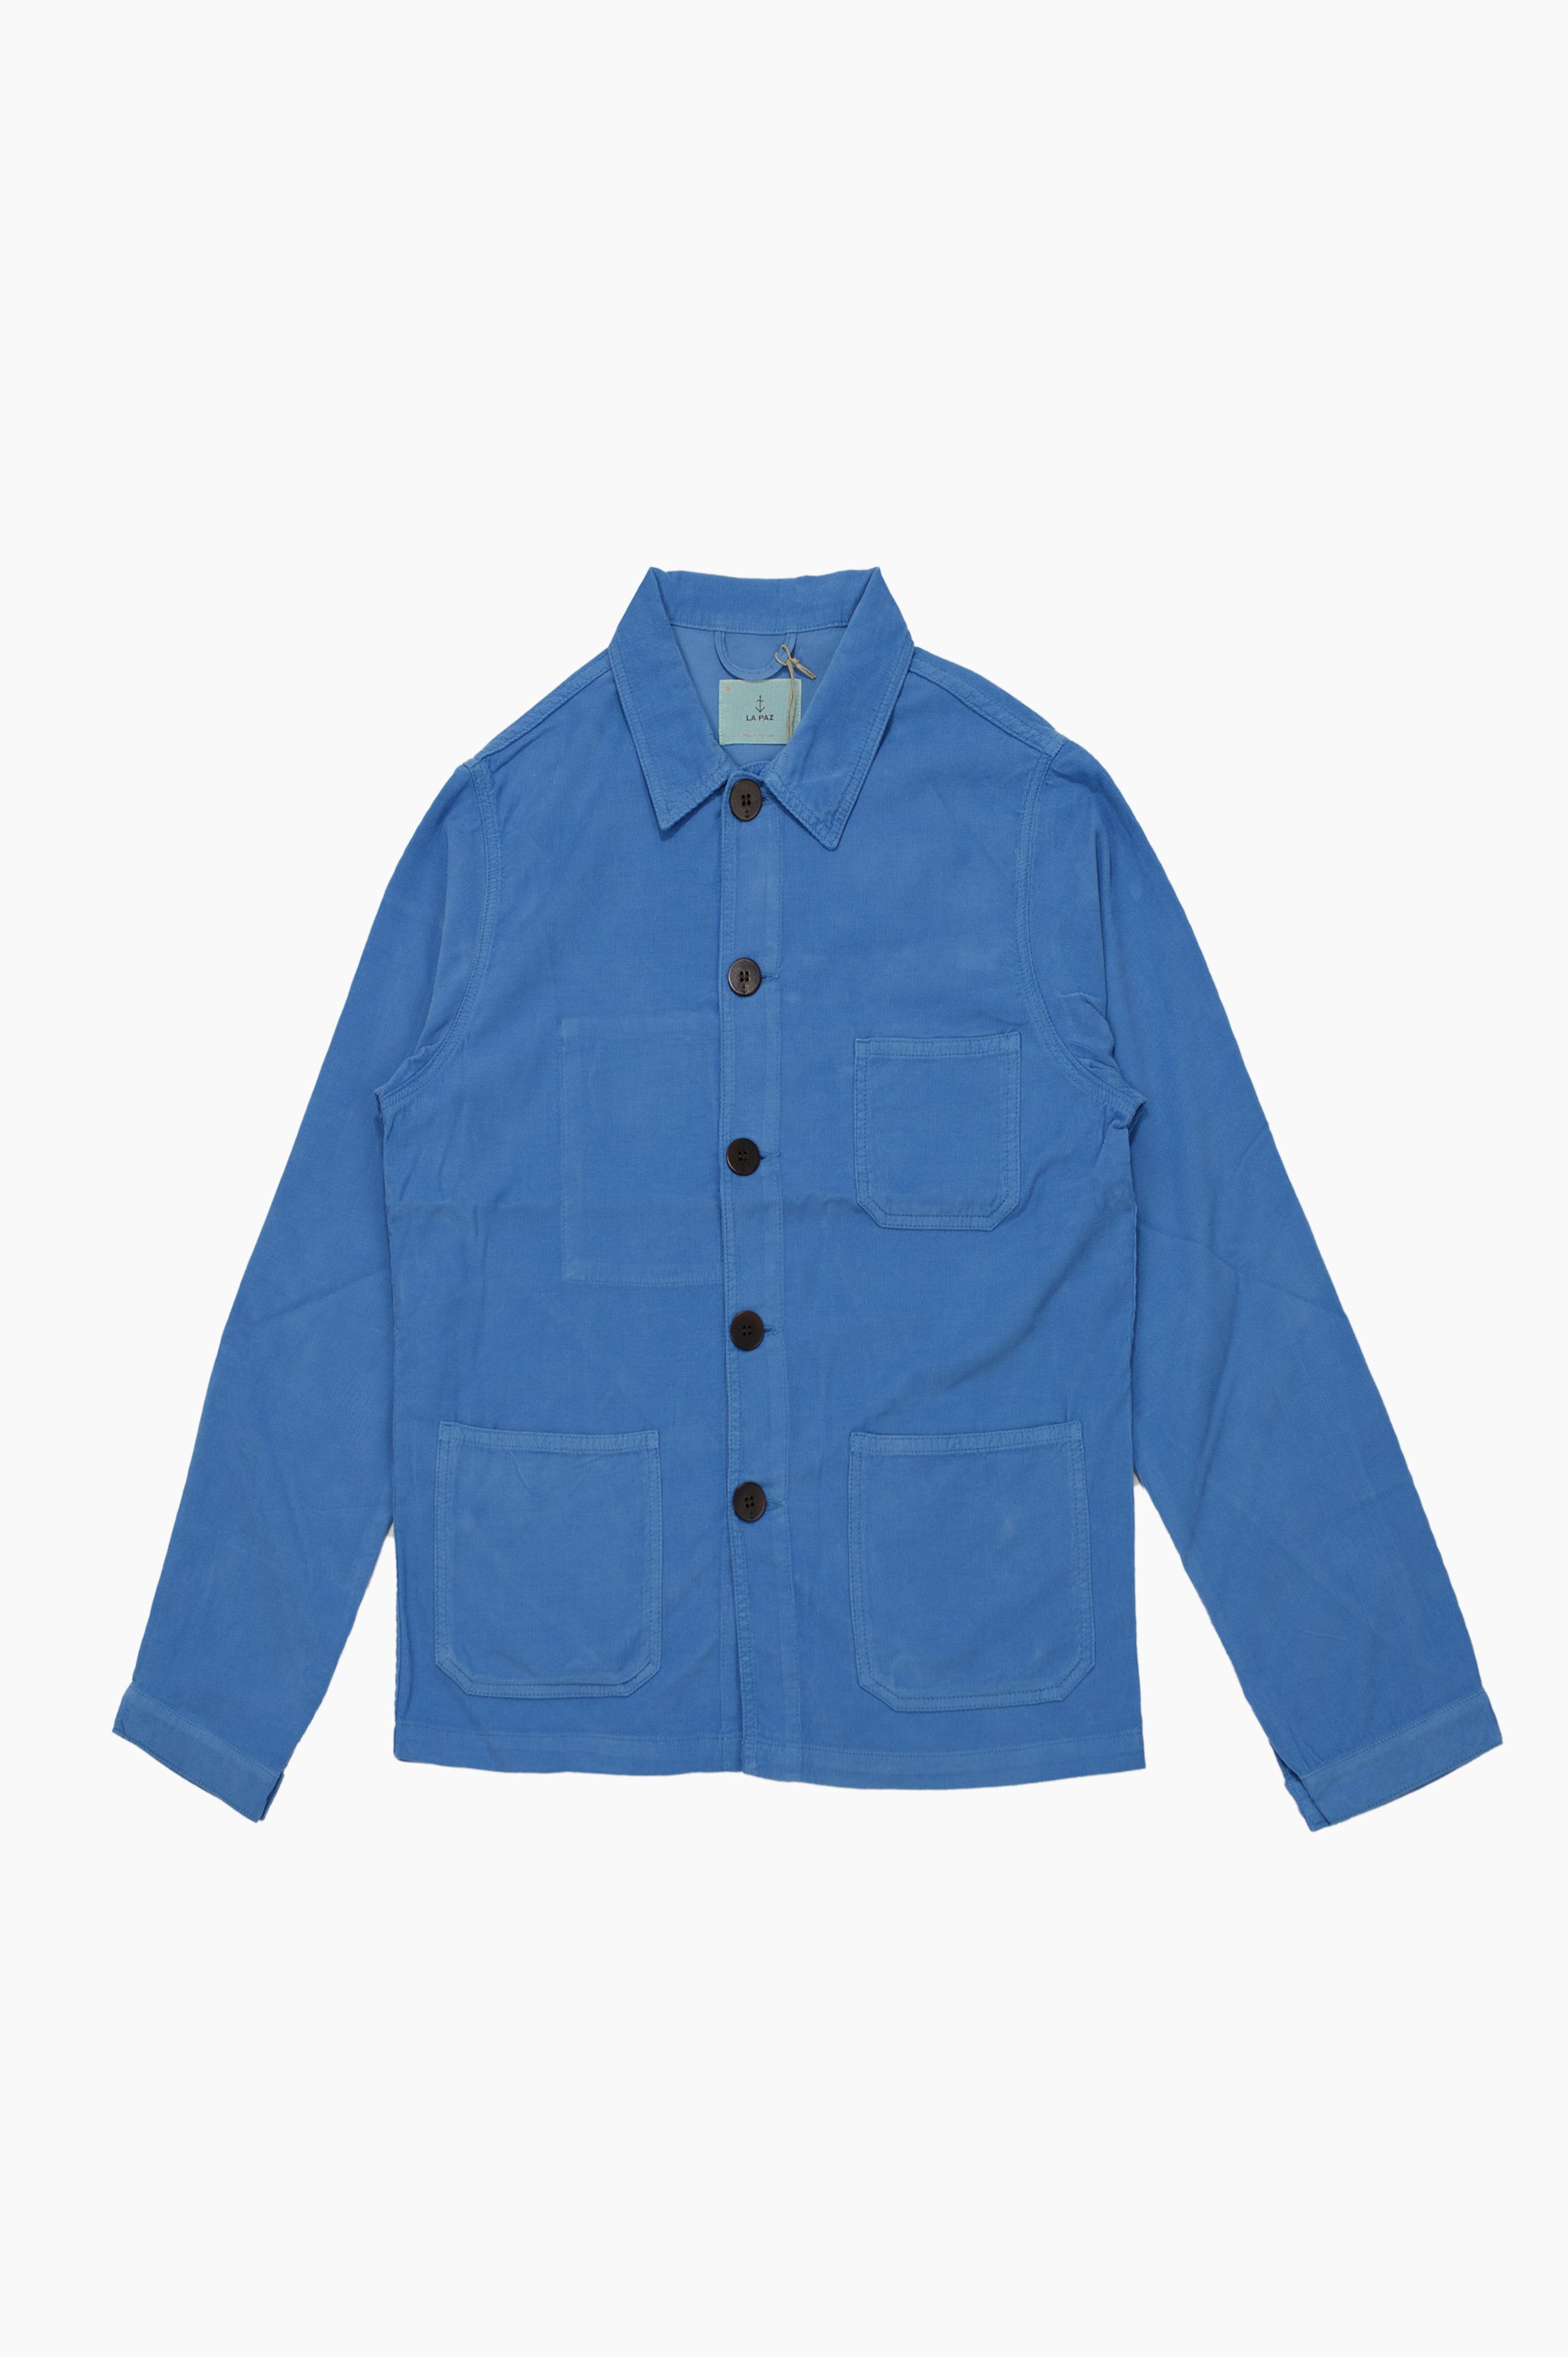 Baptista Worker Jacket Blue